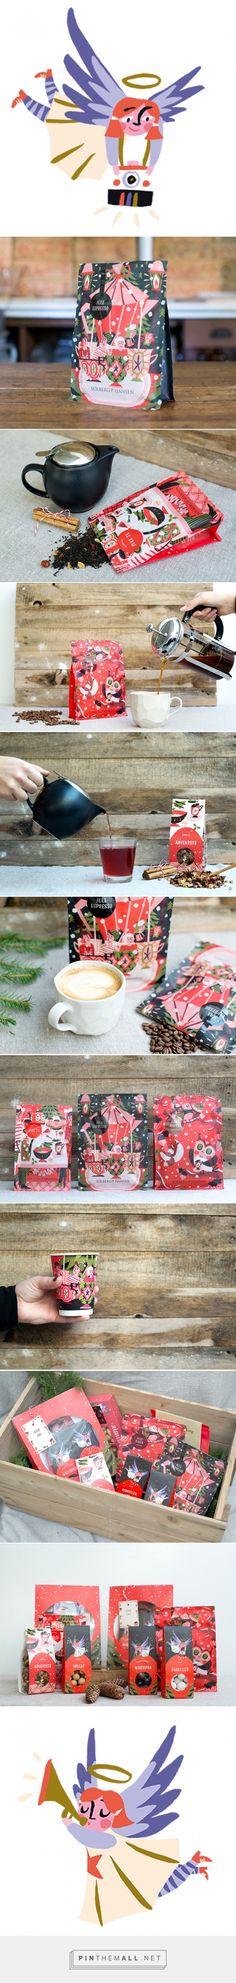 Christmas Campaign / Solberg & Hansen by Marijke Buurlage